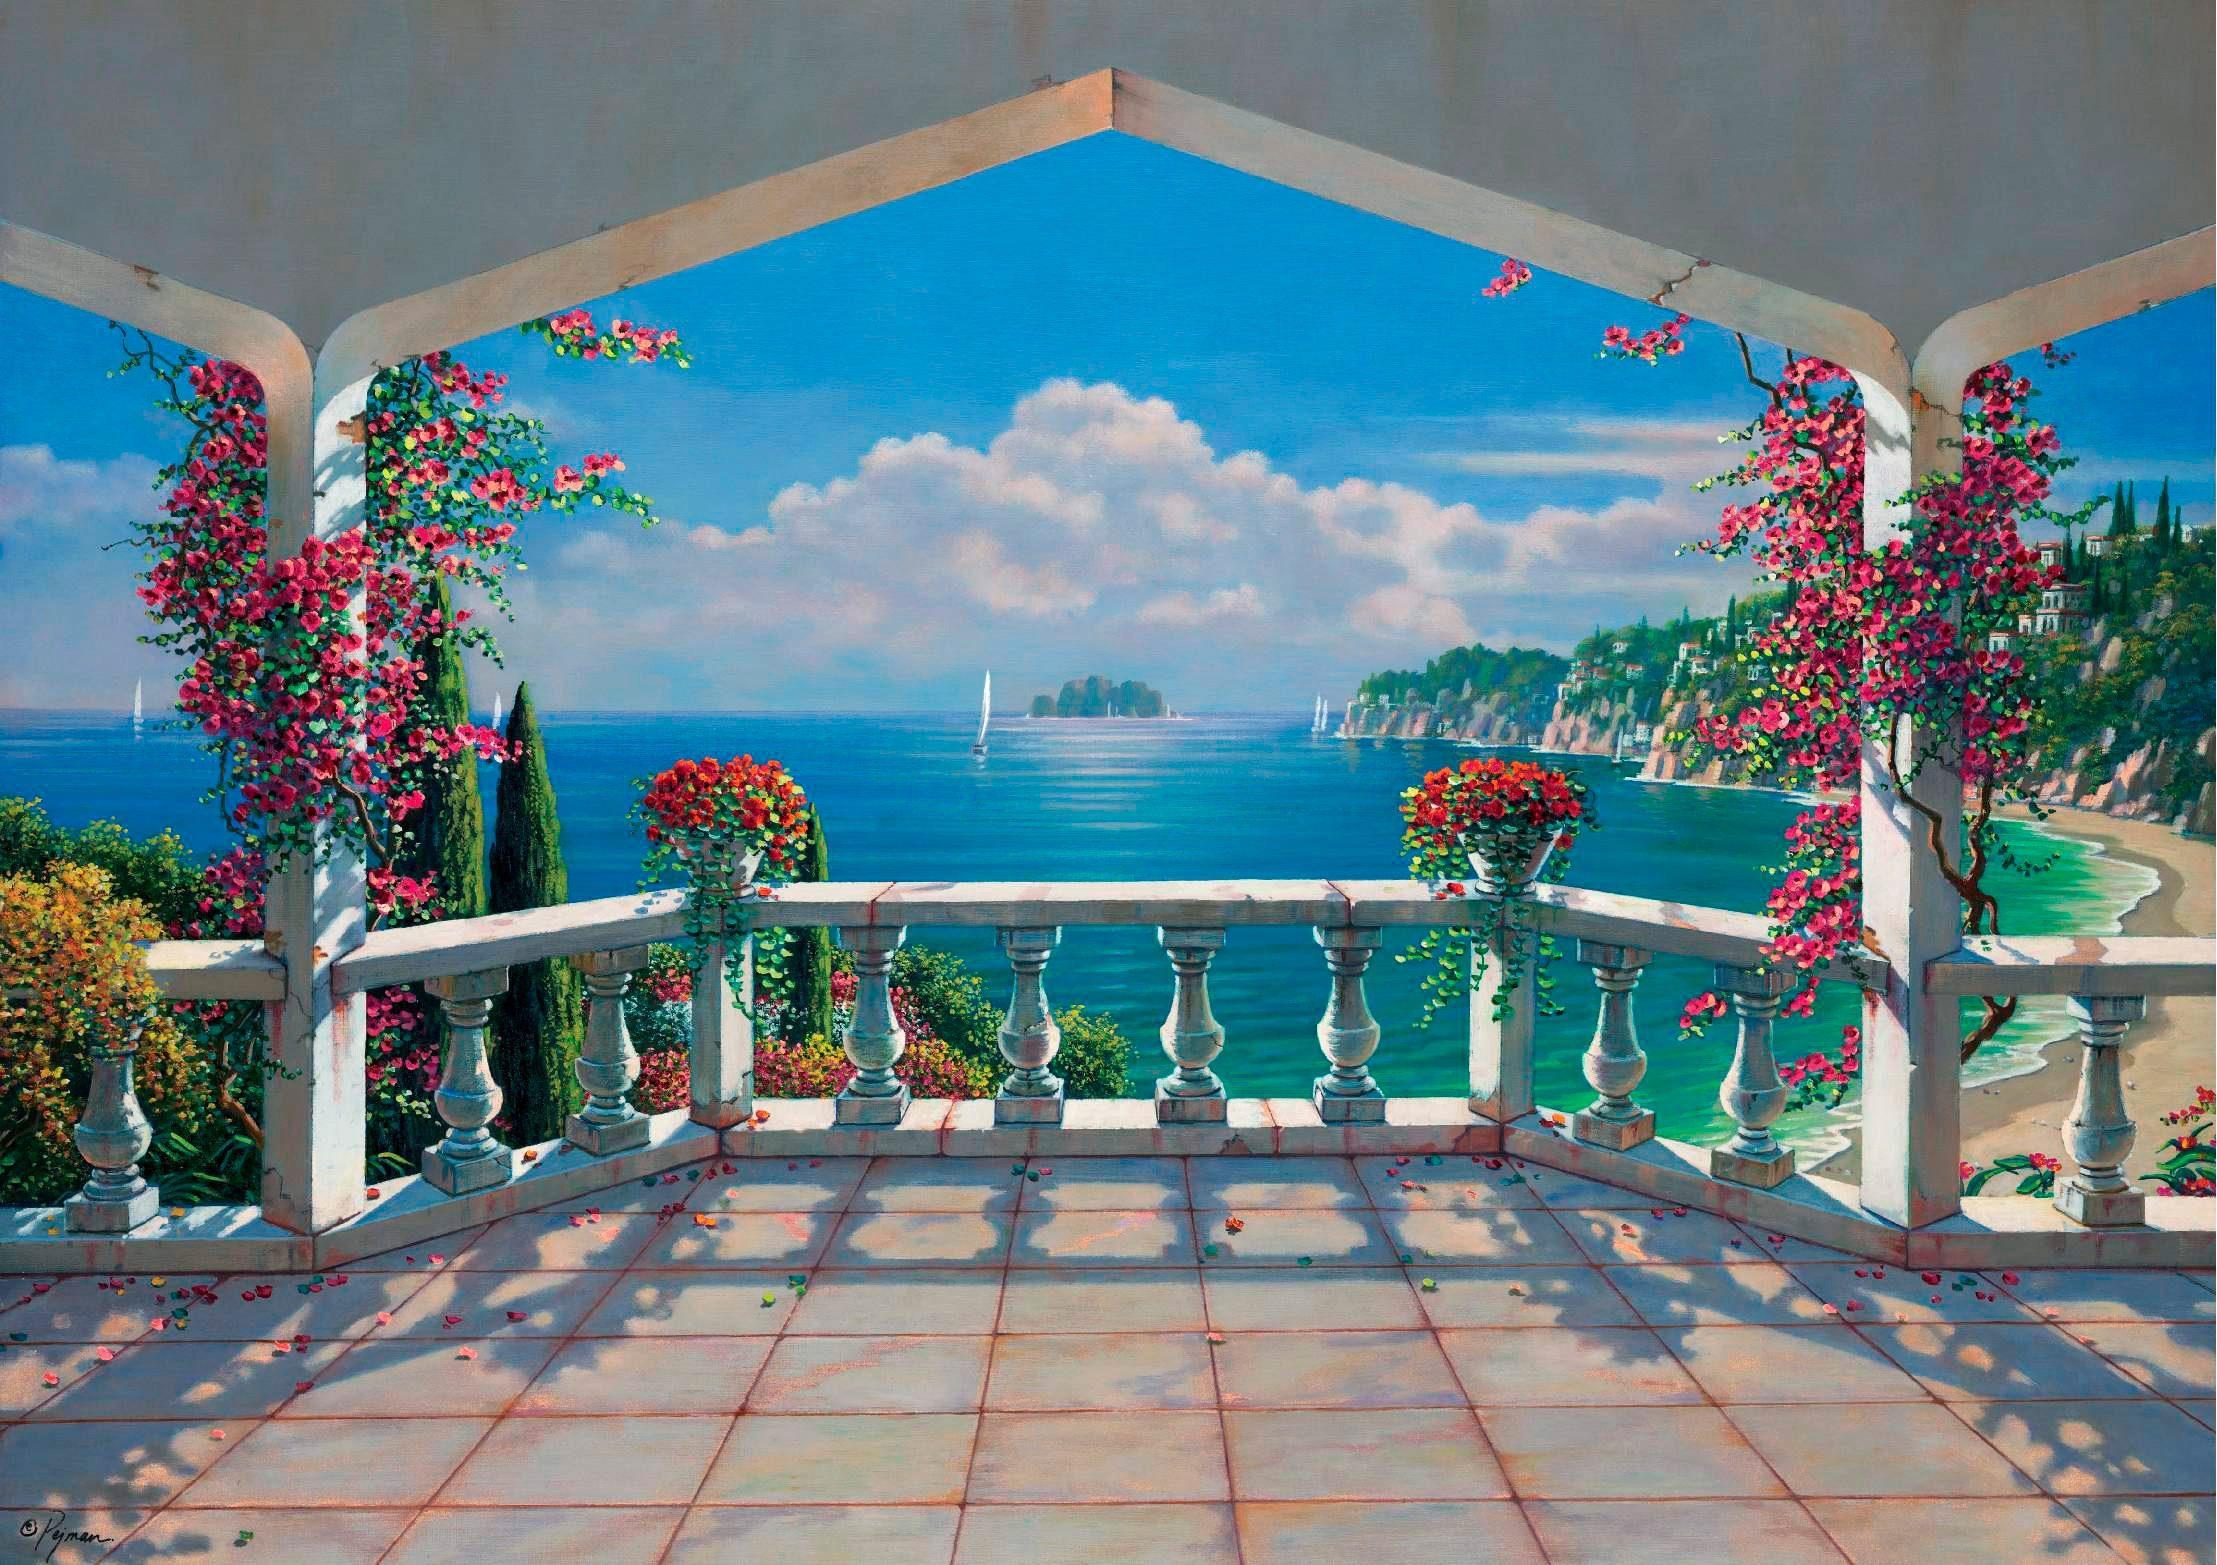 PAPERMOON Fototapete »Villa de Vista«, Vlies, 7 Bahnen, 350 x 260 cm